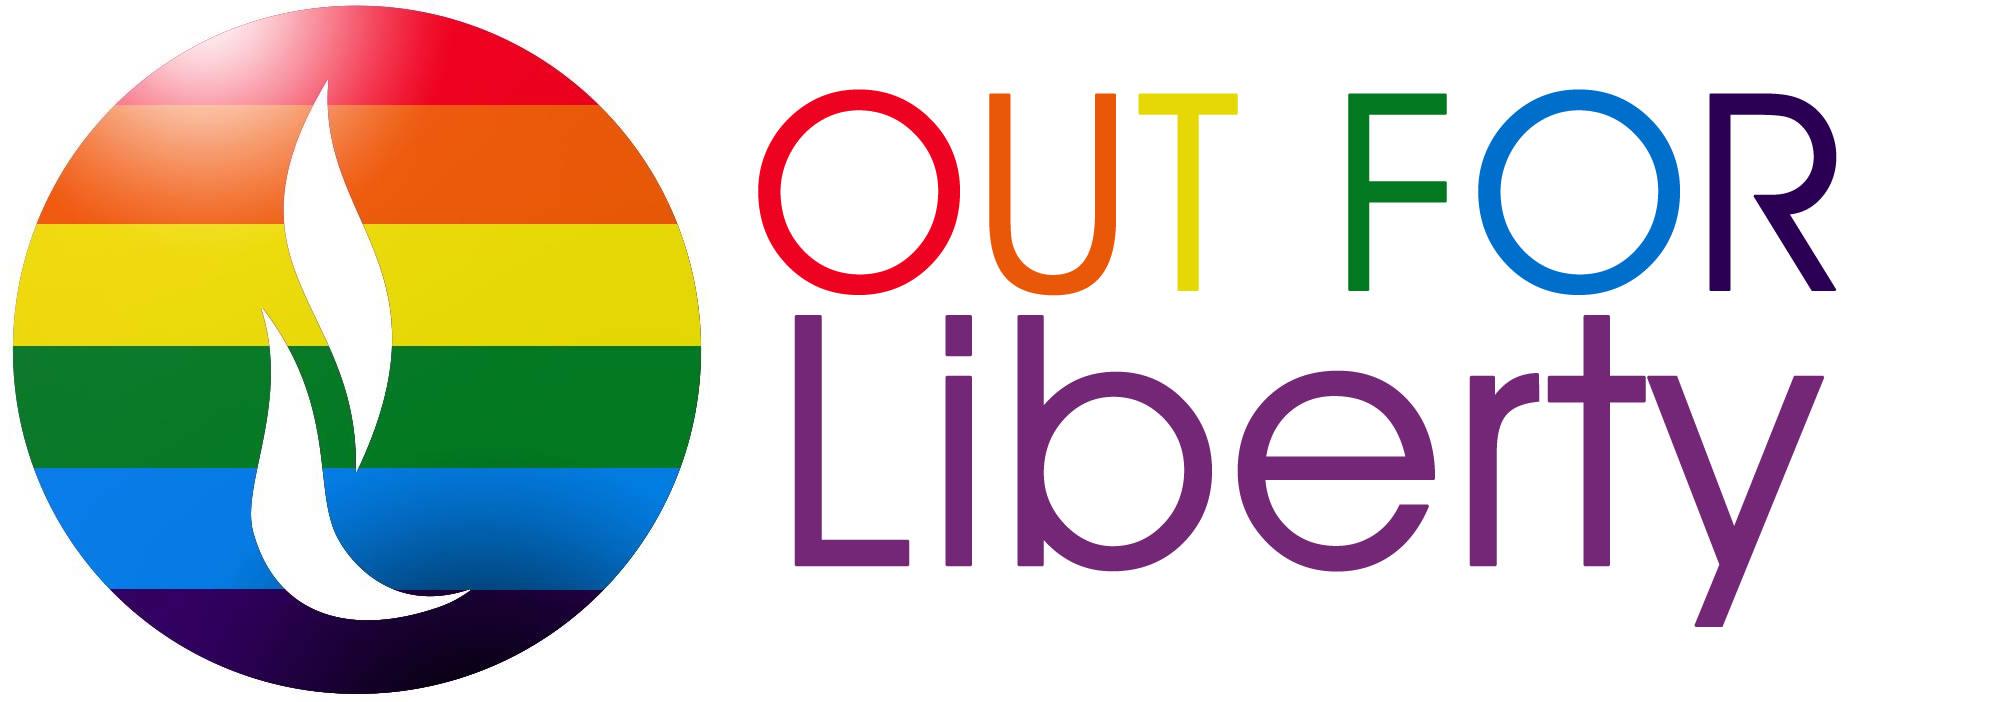 outForLiberty.jpg